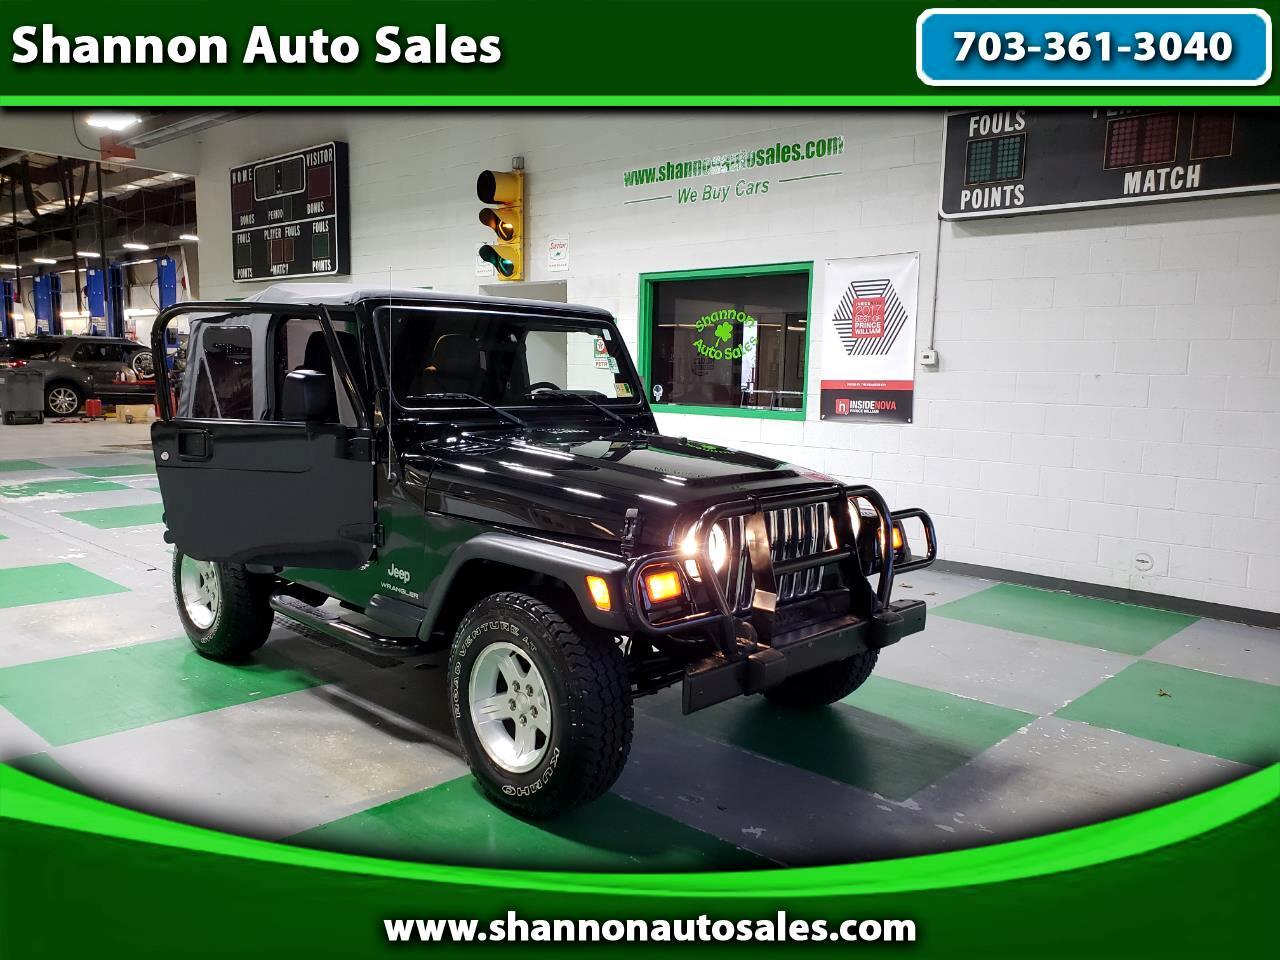 Used Cars For Sale Manassas Va 20110 Shannon Auto Sales 2006 Jeep Wrangler Fuel Filter Se